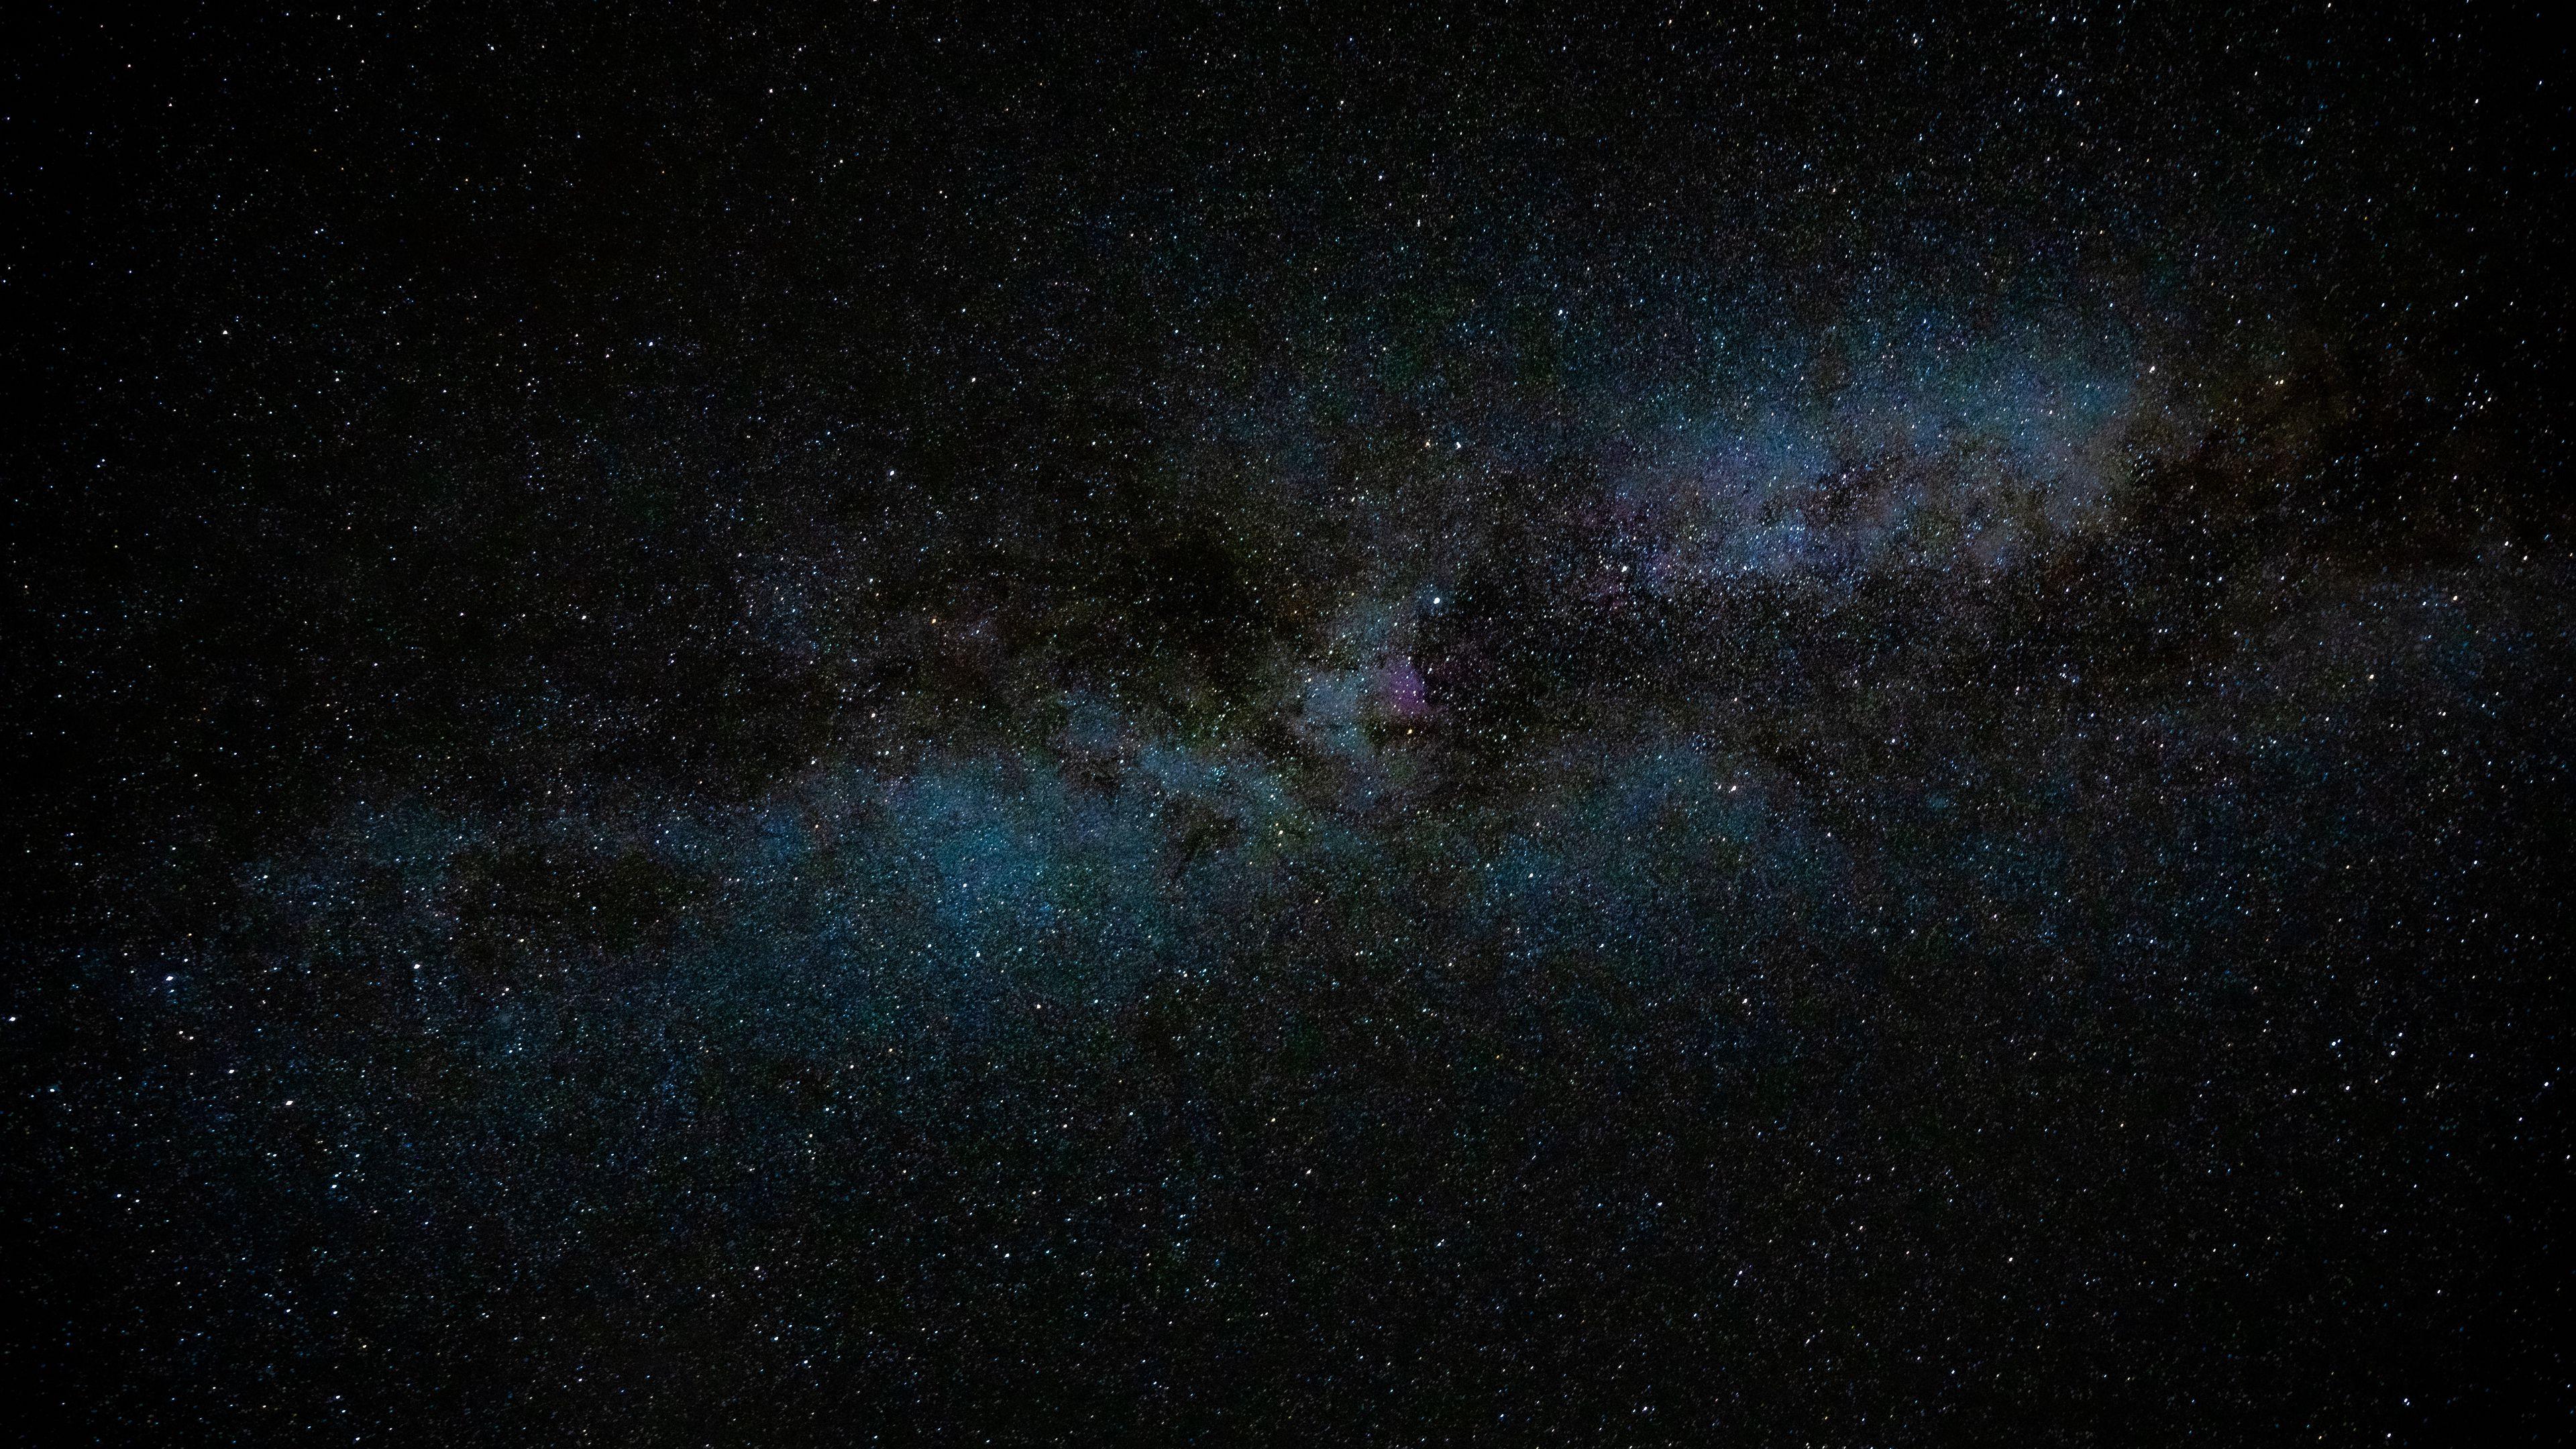 Download wallpaper 3840x2160 nebula ...